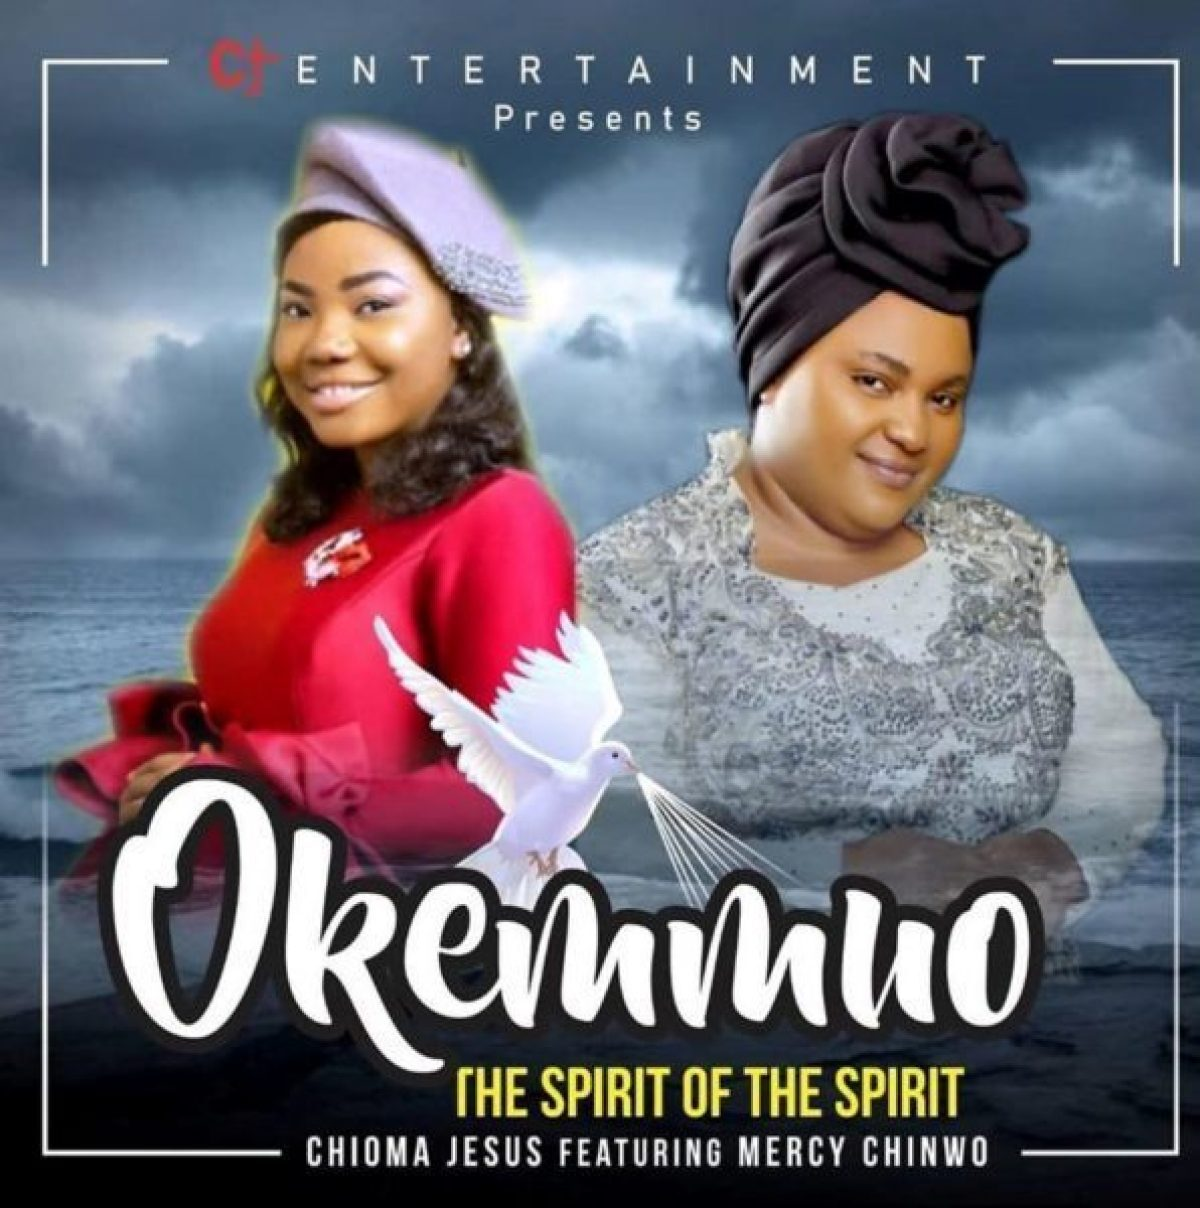 Chioma Jesus - Okemmuo Ft. Mercy Chinwo (Official Video + Lyrics)